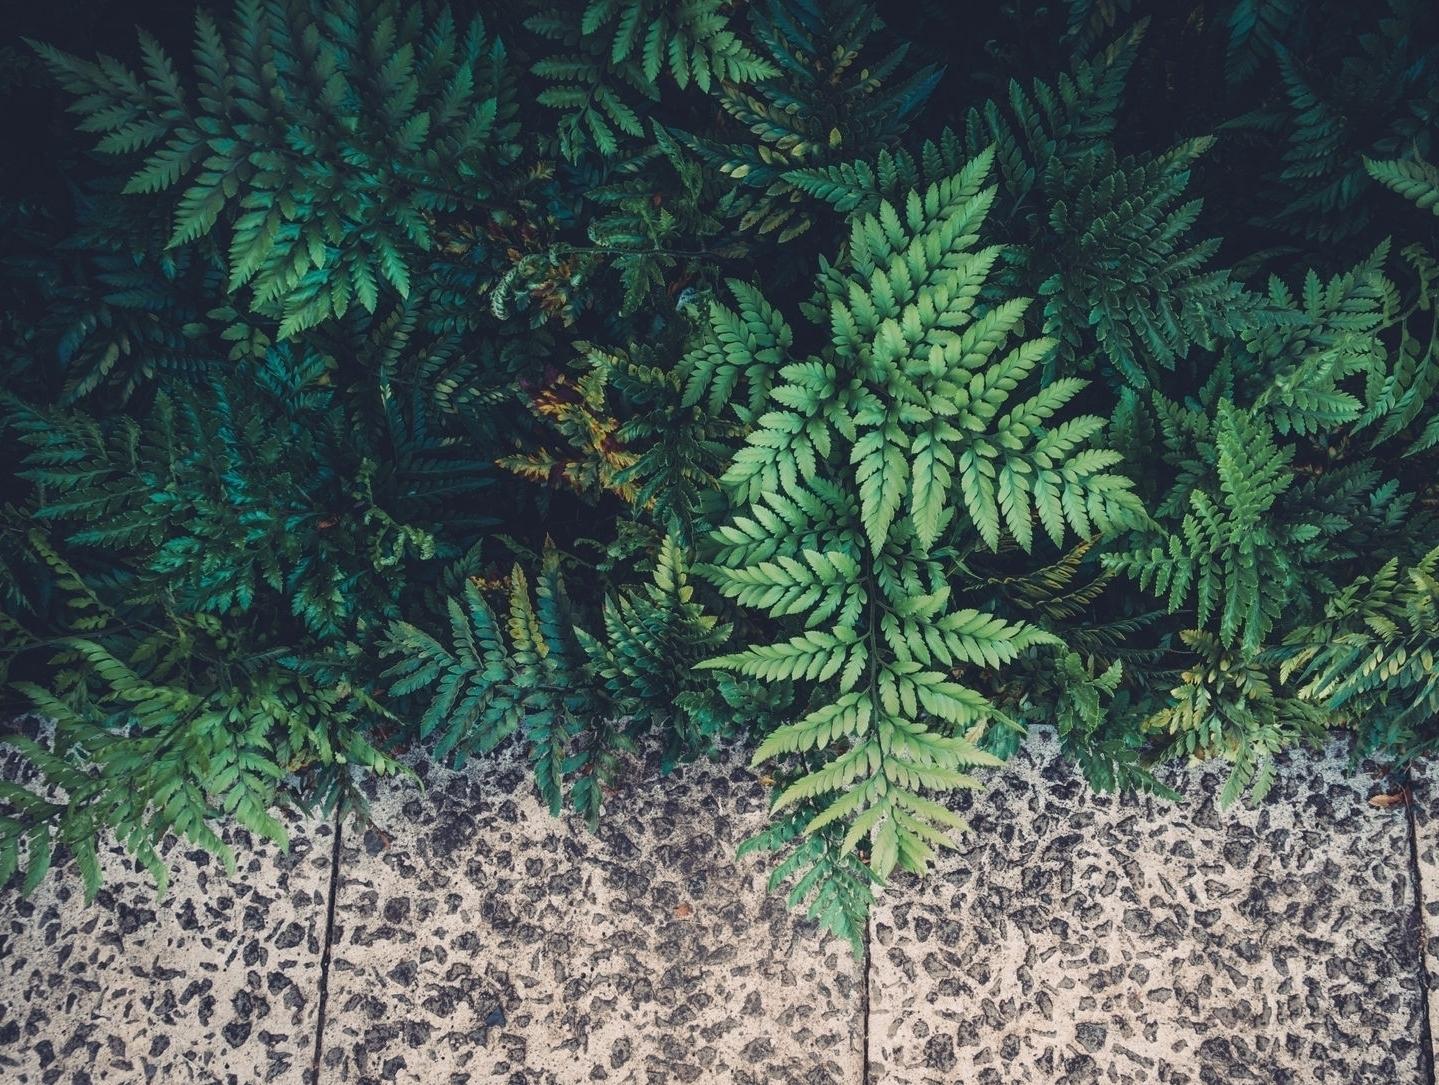 fernssidewalk.jpg